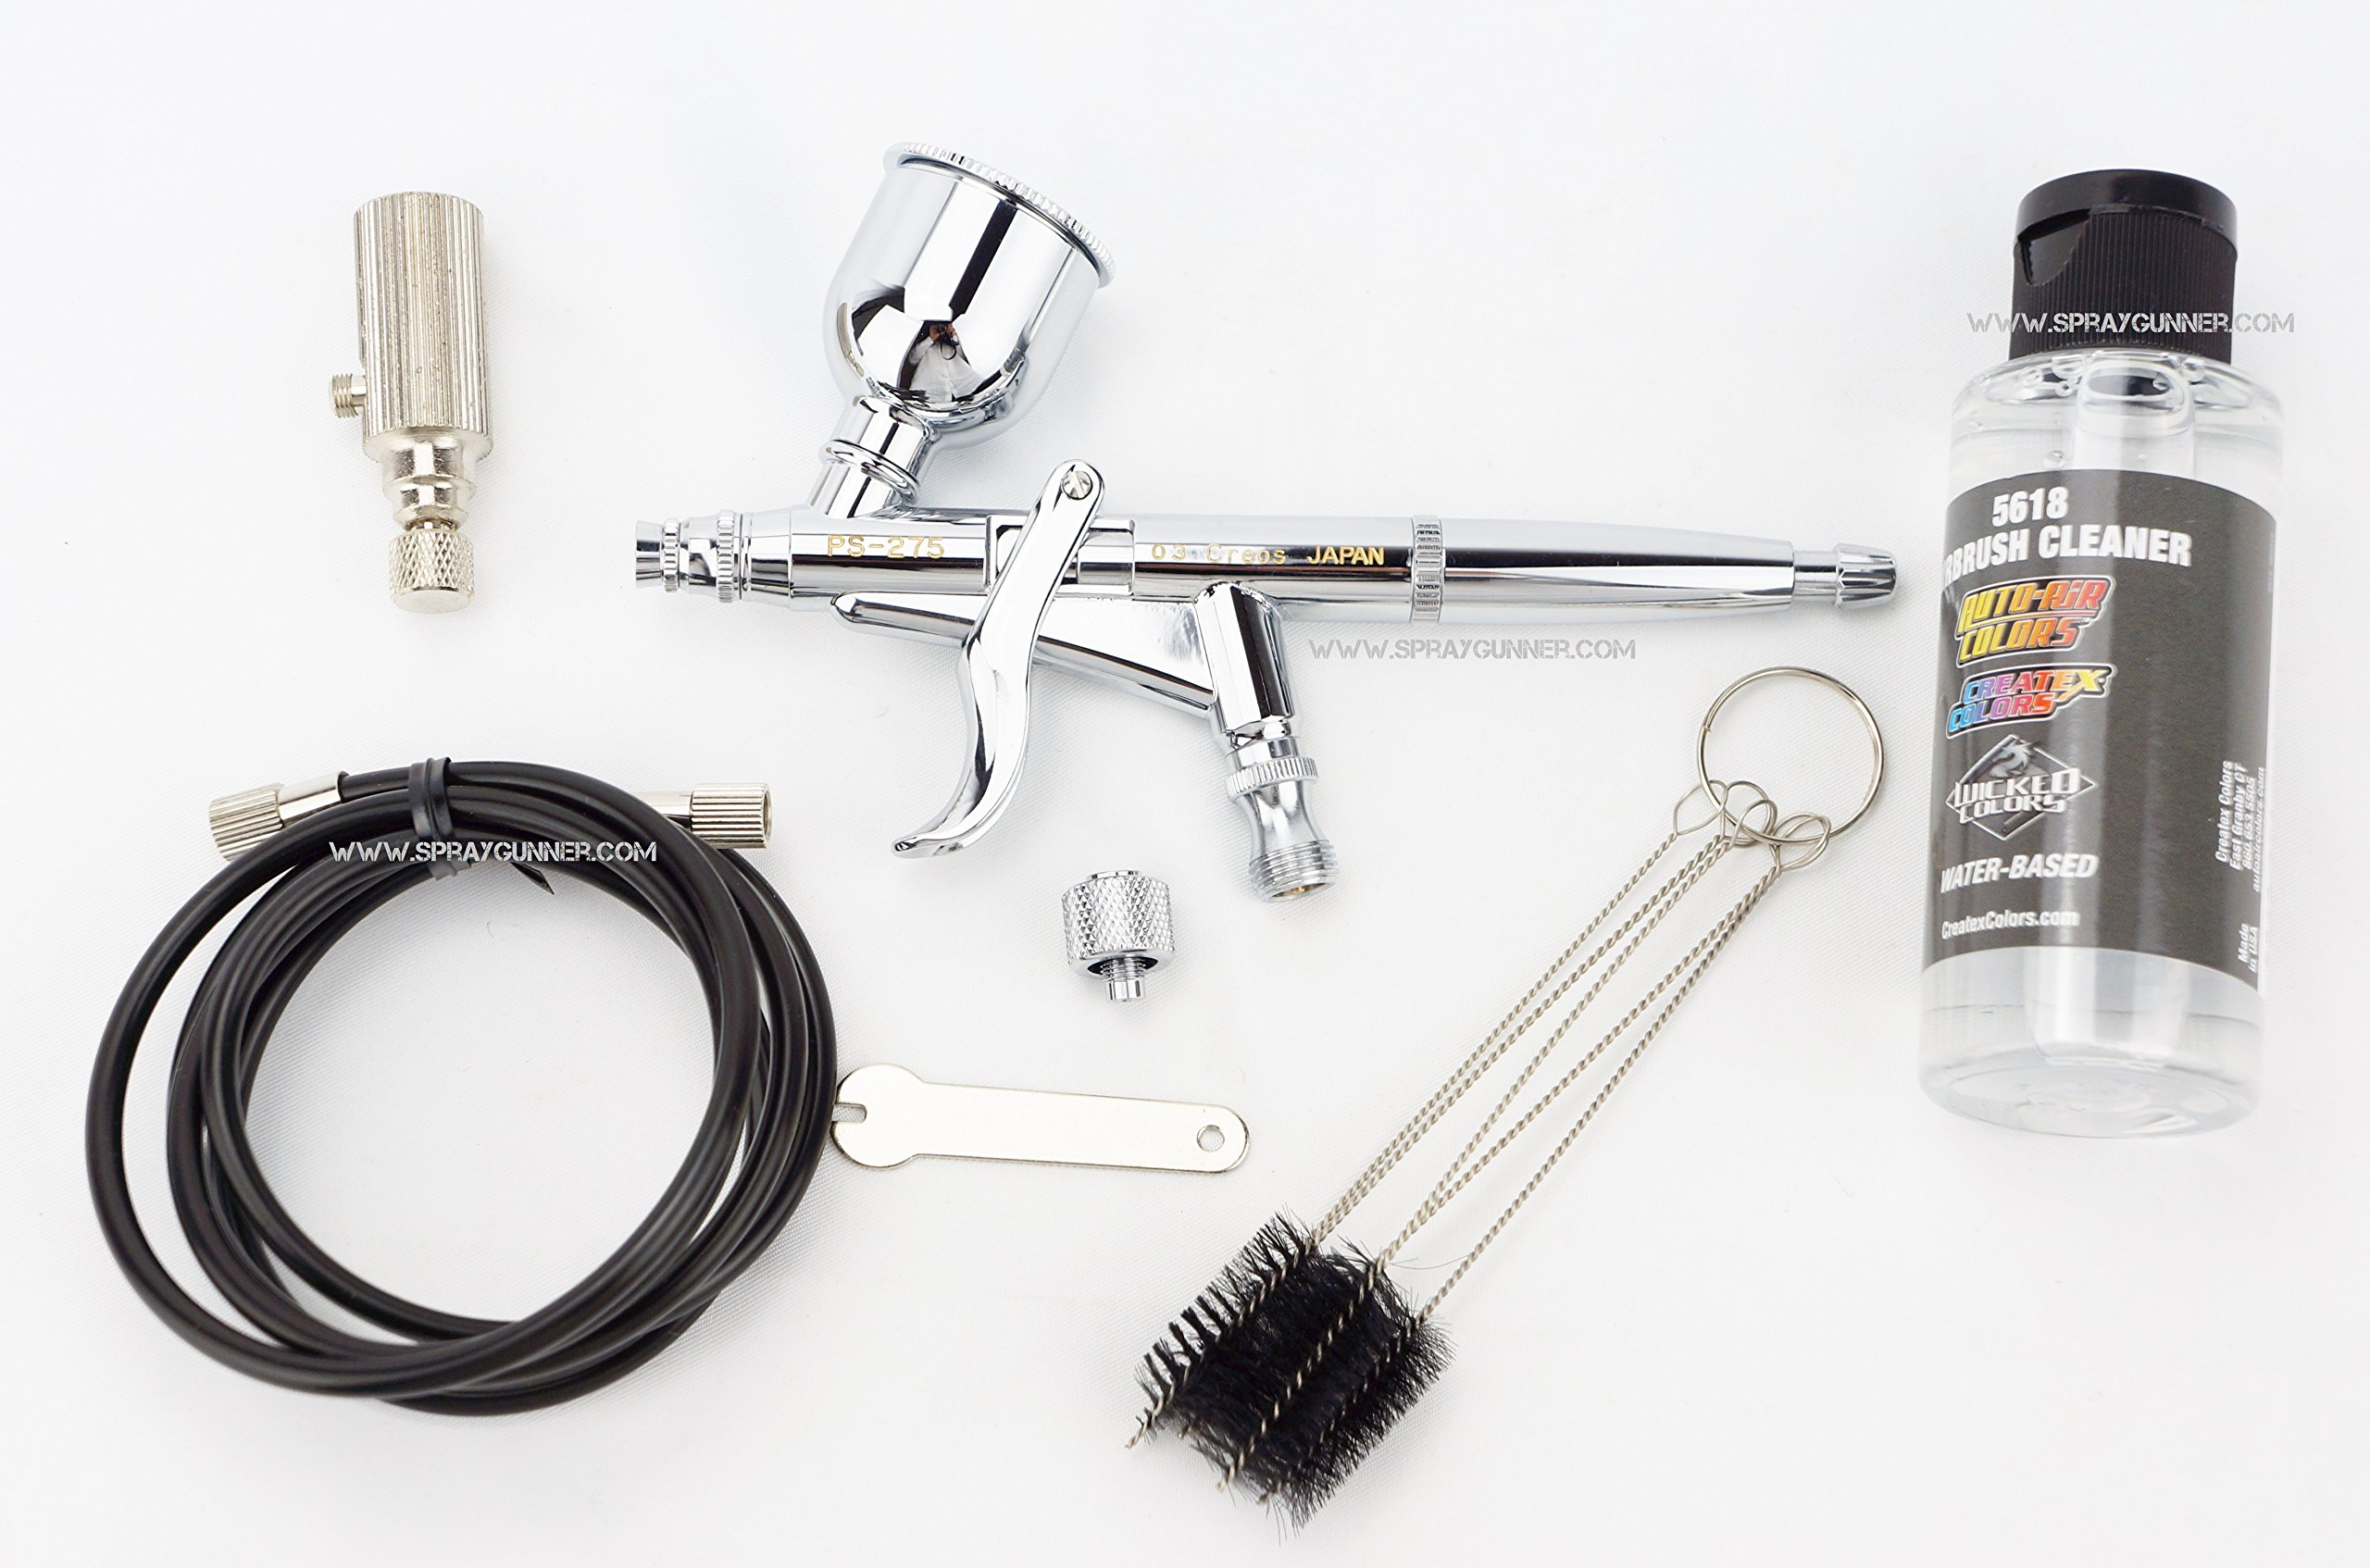 Procon Boy MR. AIRBRUSH GSI Creos PS-275 Trigger Type mr hobby airbrush 0.3mm nozzle with BONUS by SprayGunner